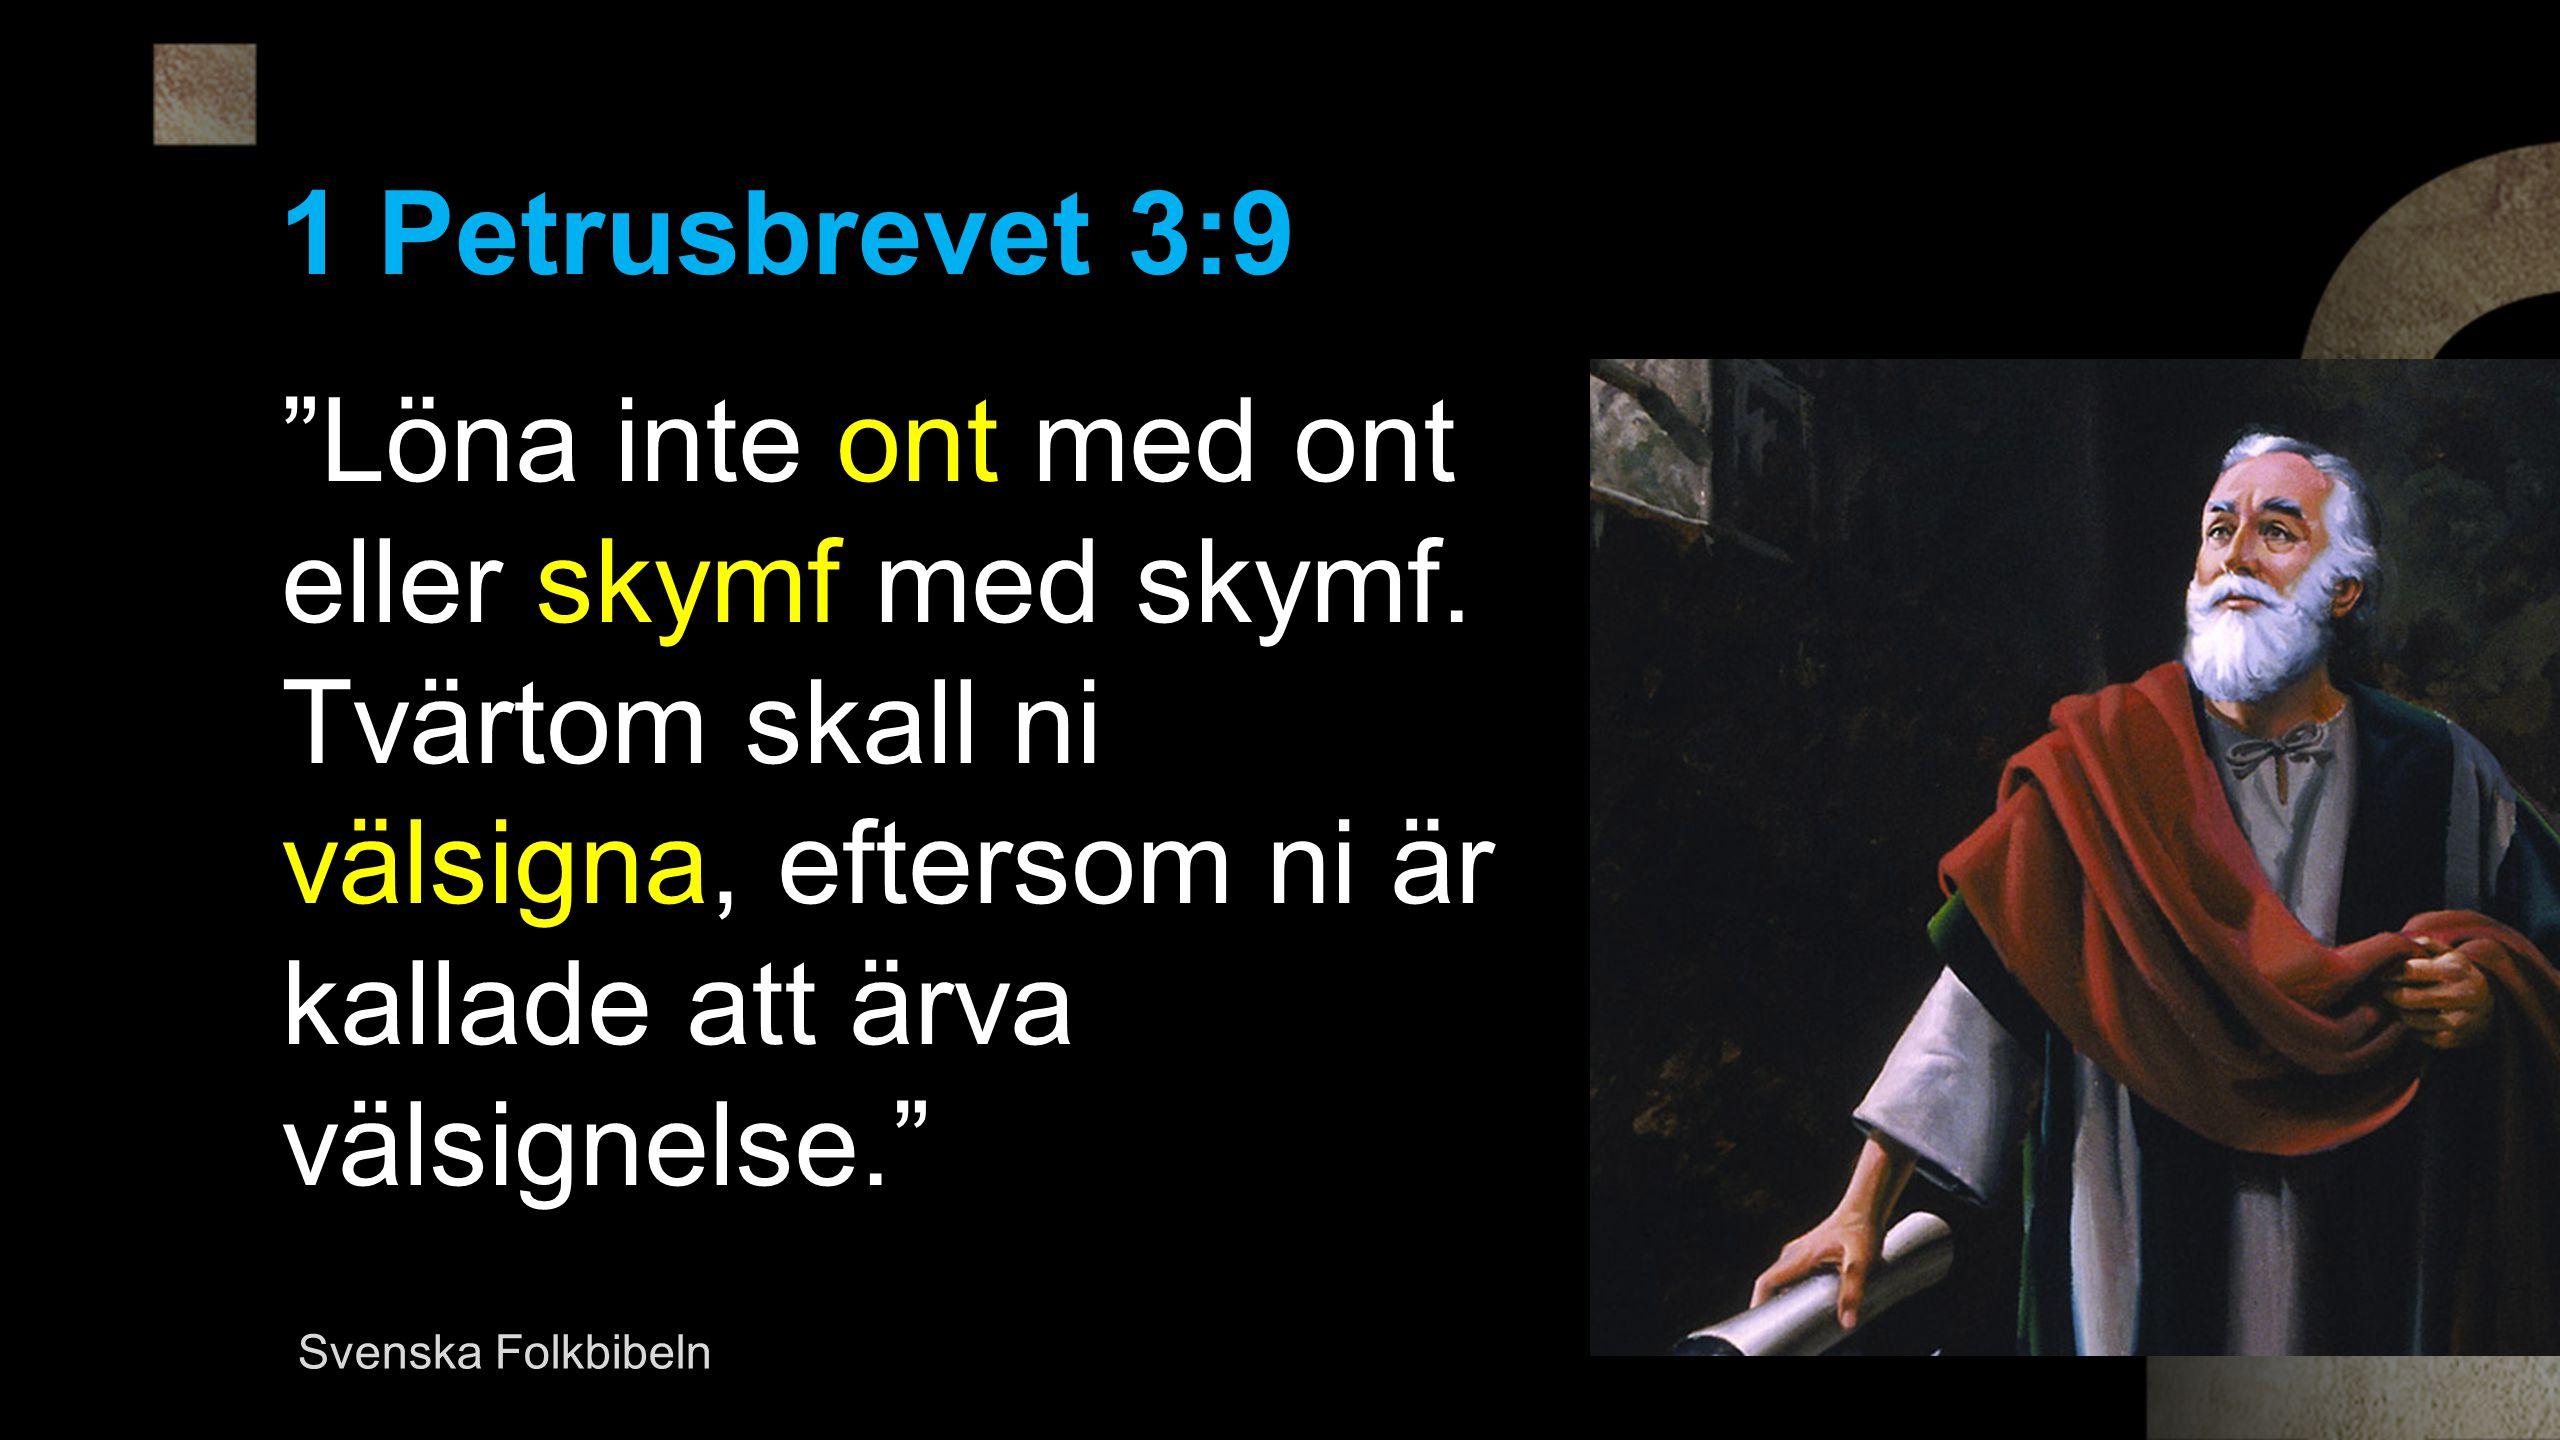 1 Petrusbrevet 3:9 Löna inte ont med ont eller skymf med skymf.